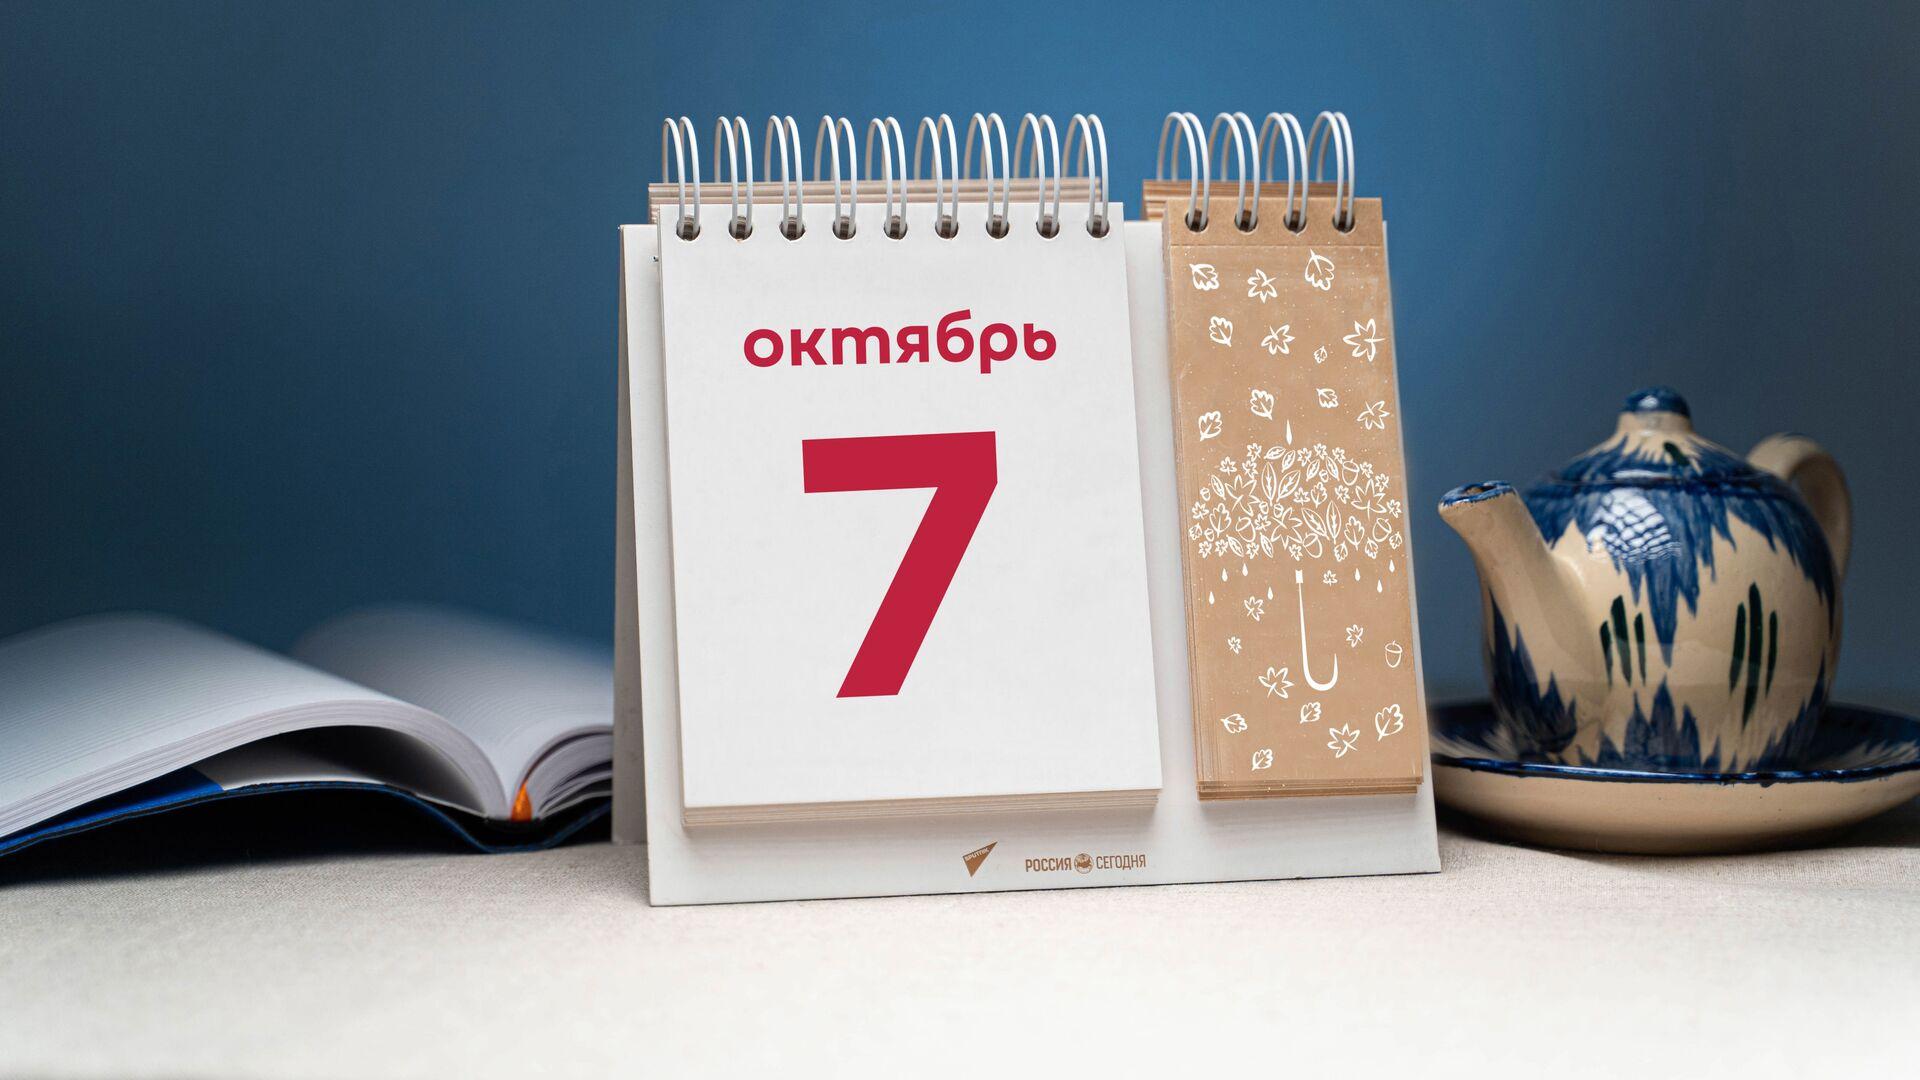 День 7 октября - Sputnik Тоҷикистон, 1920, 07.10.2021